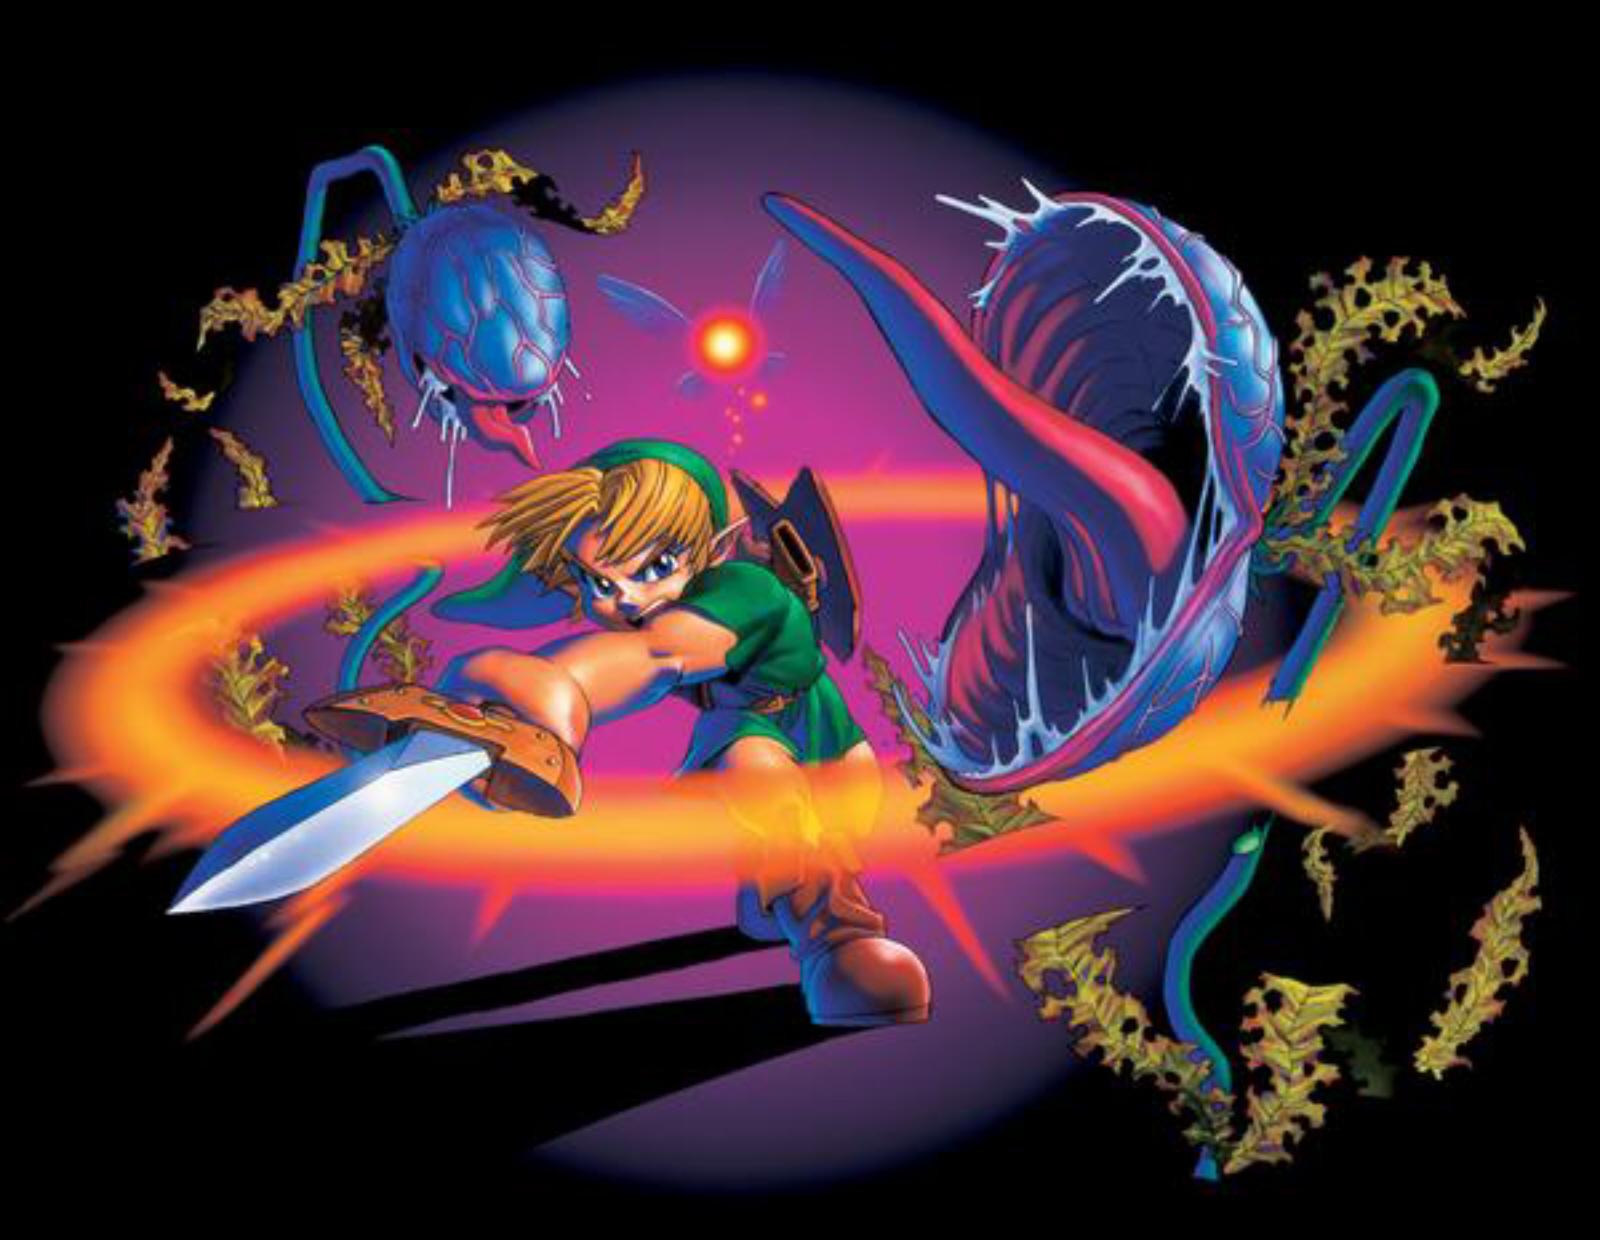 Ocarina Of Time 3d Wallpaper Deku Baba Killing Spin Attack